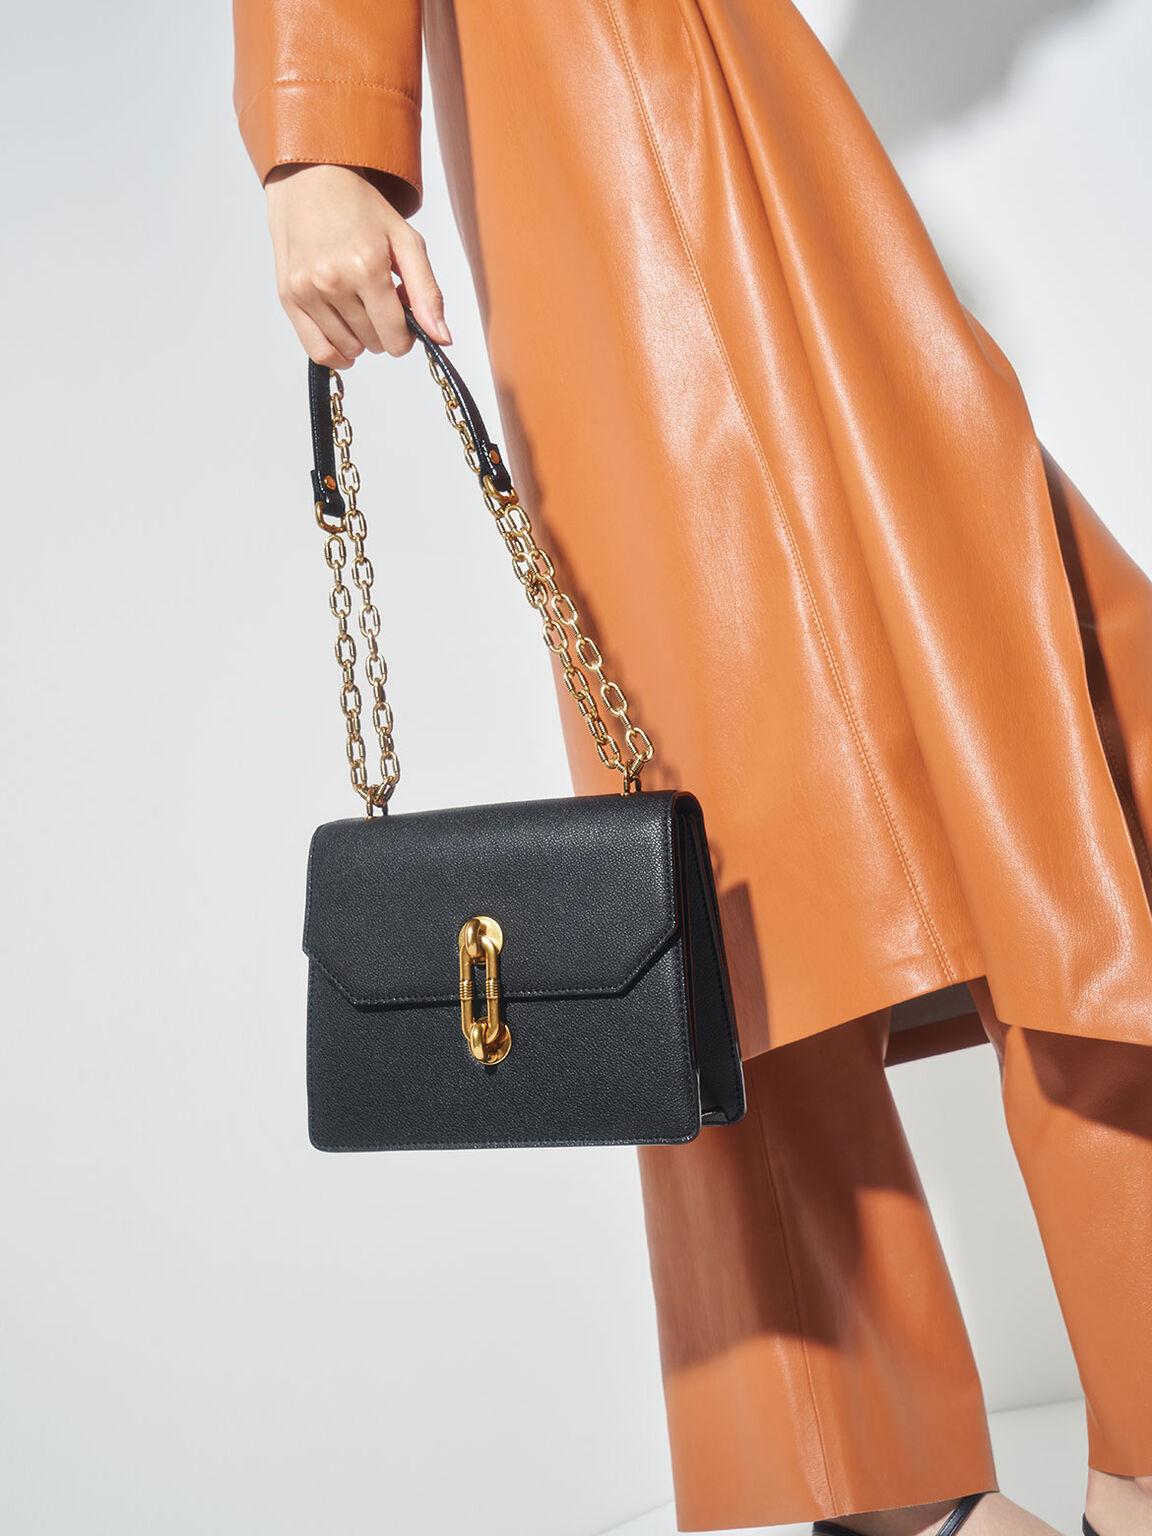 Double Chain Strap Turn-Lock Bag, Black, hi-res